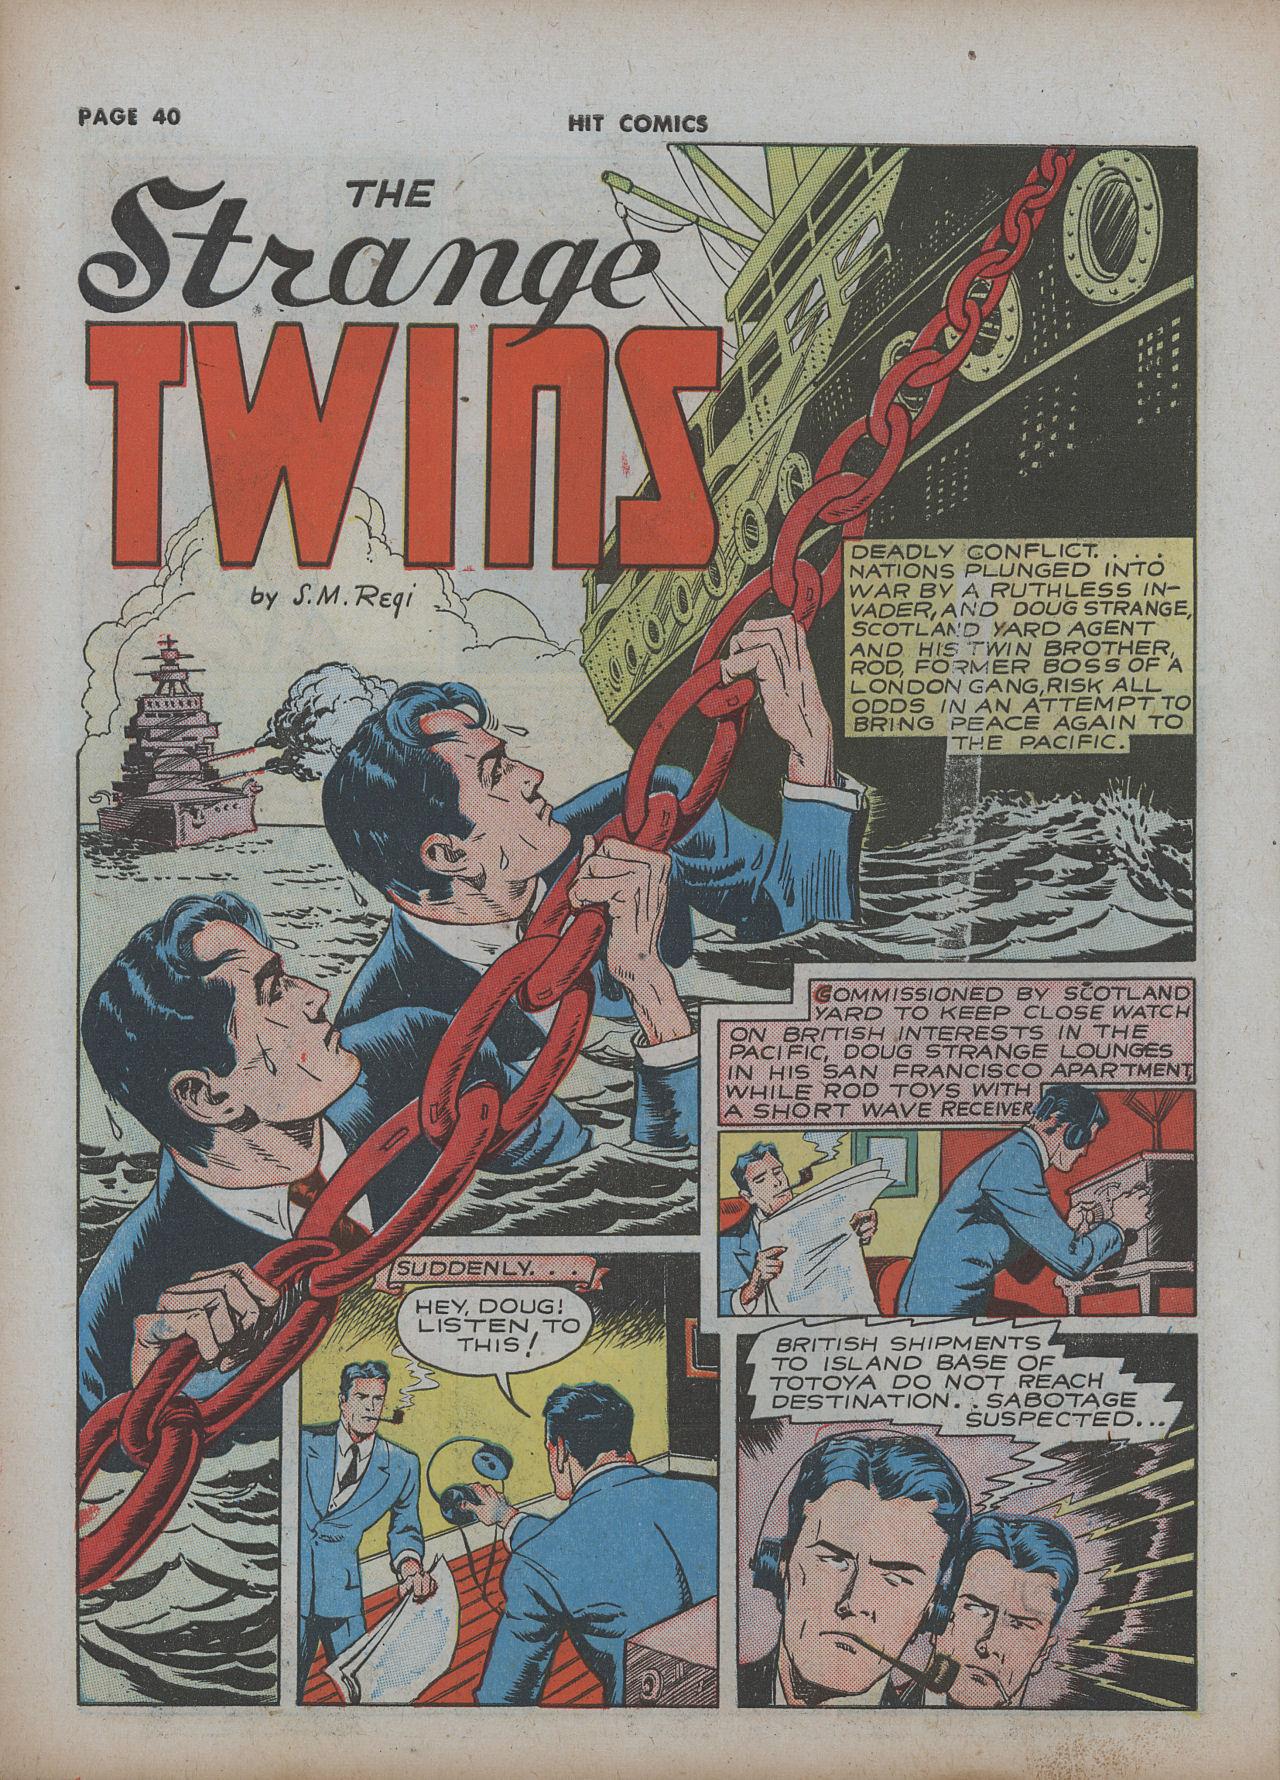 Read online Hit Comics comic -  Issue #22 - 42